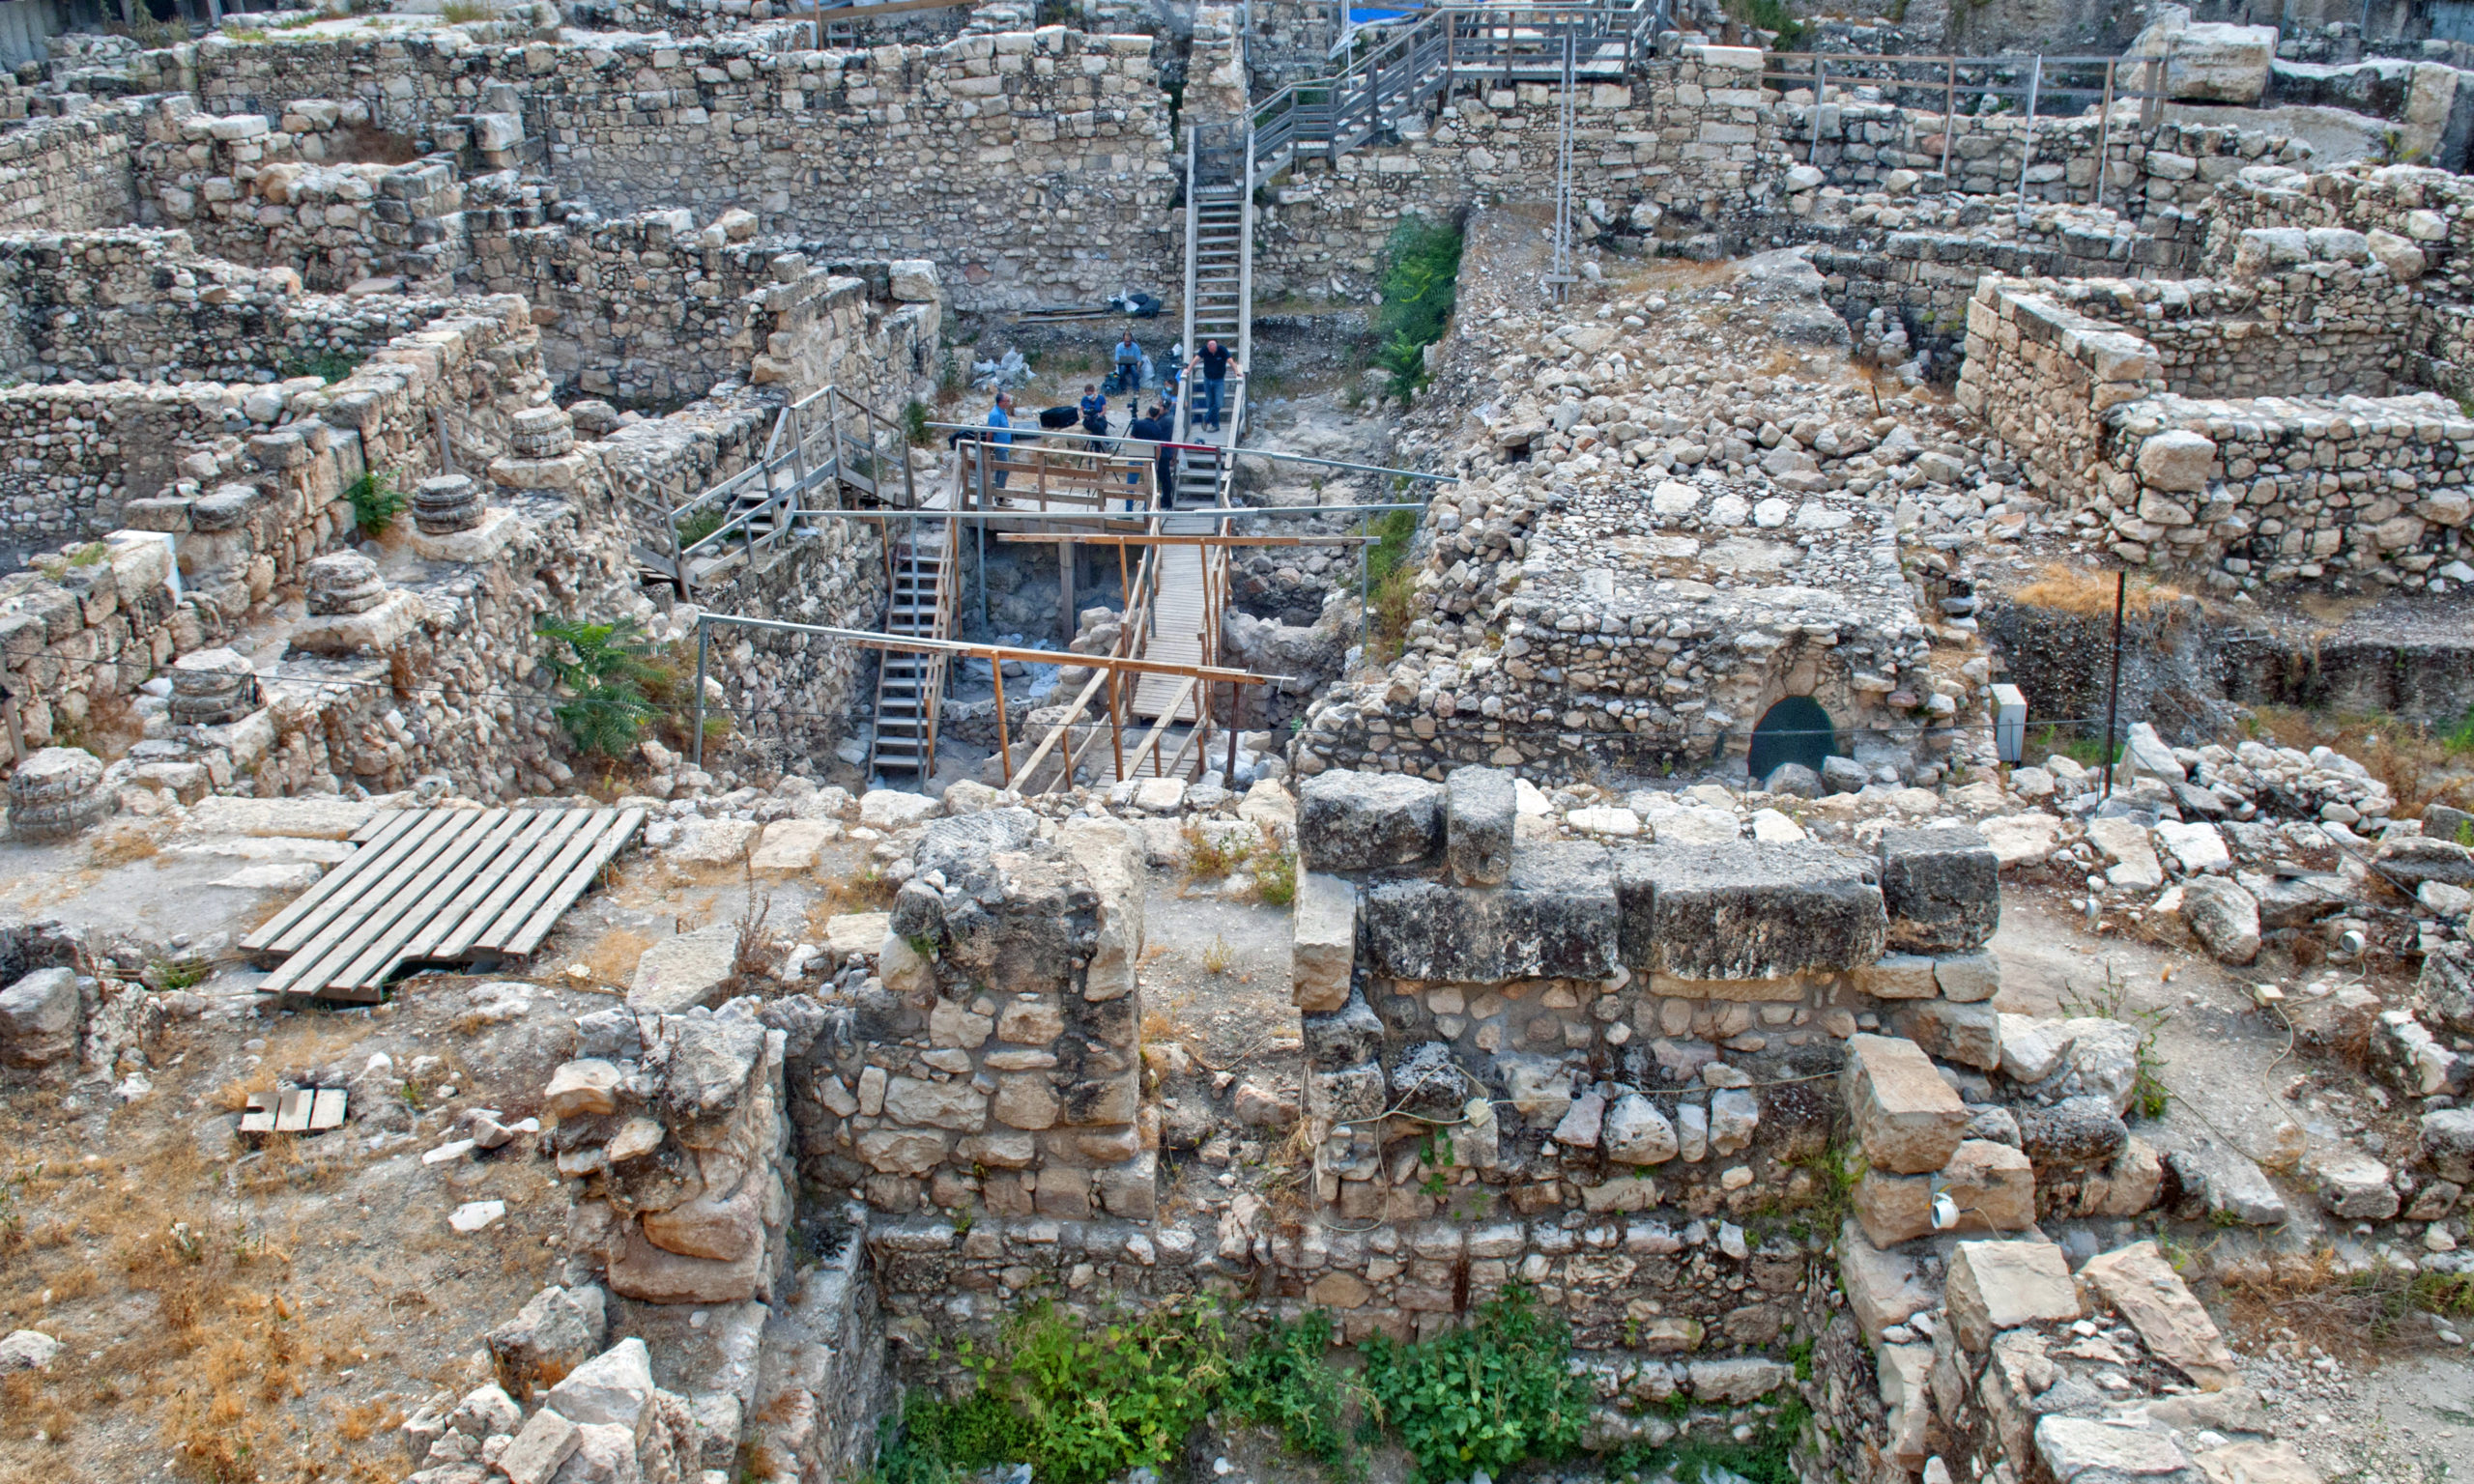 Givaty Parking Lot Excavation. Photographer Shai Halevi Israel Antiquities Authority